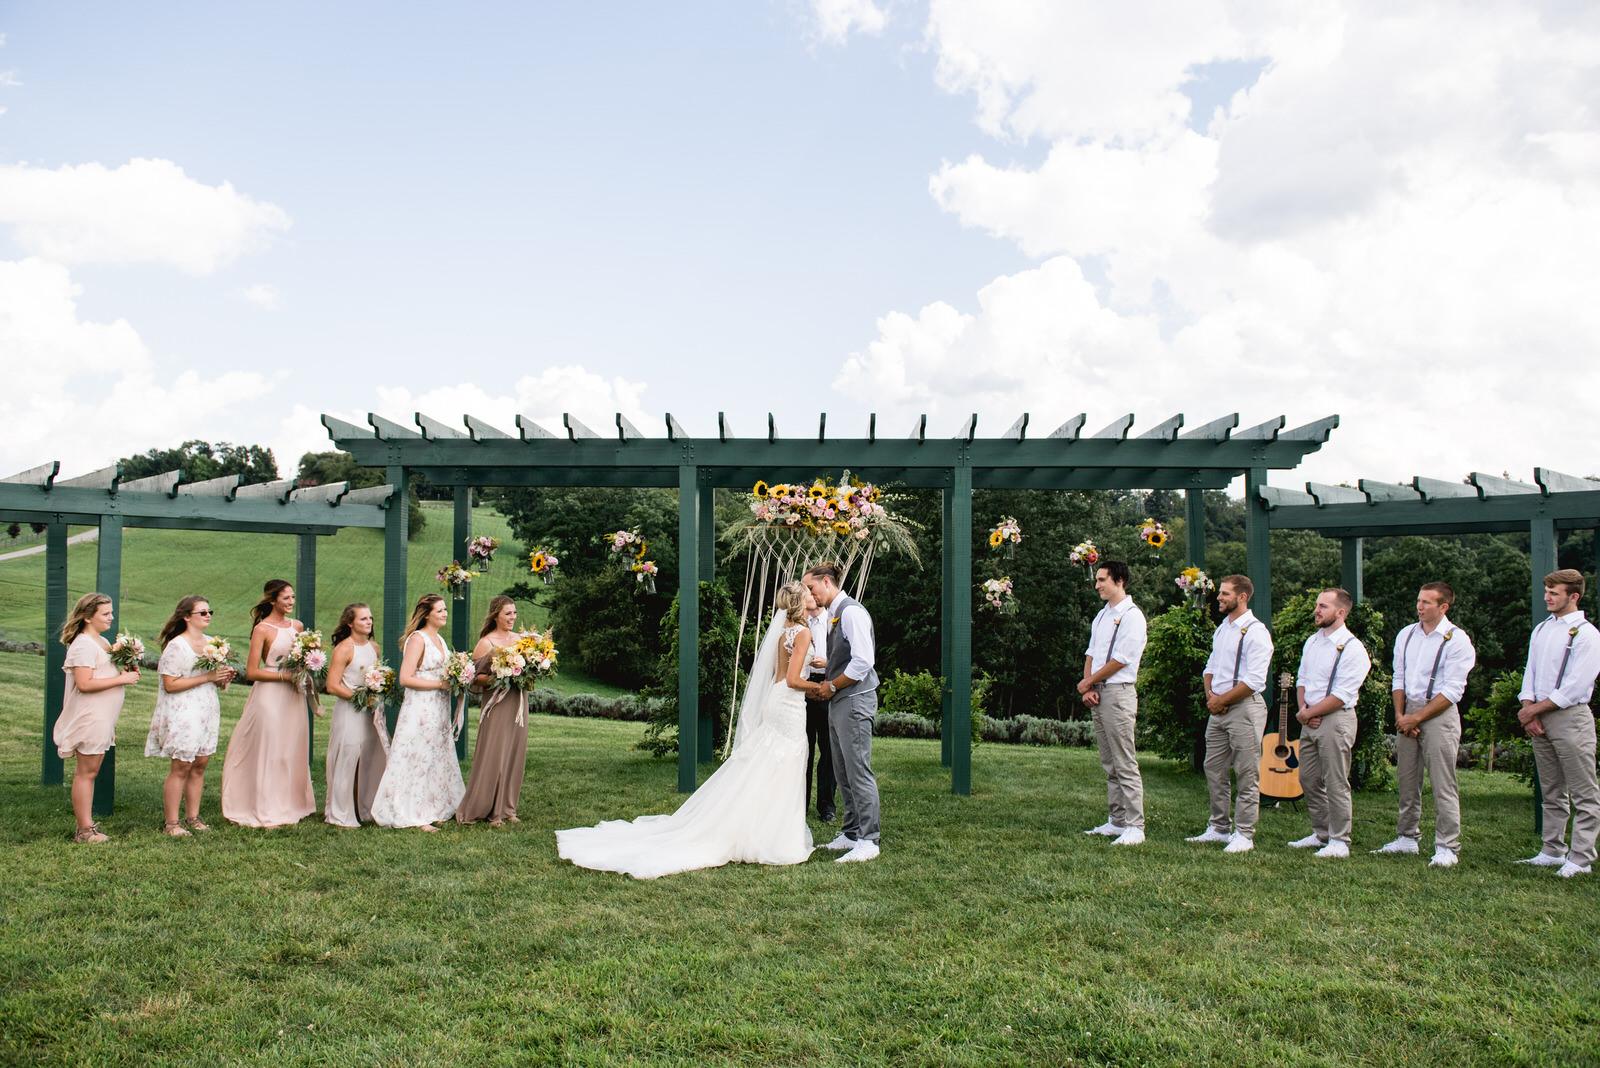 destiny-hill-farm-wedding-photos-pittsburgh-wedding-photographers-42.jpg